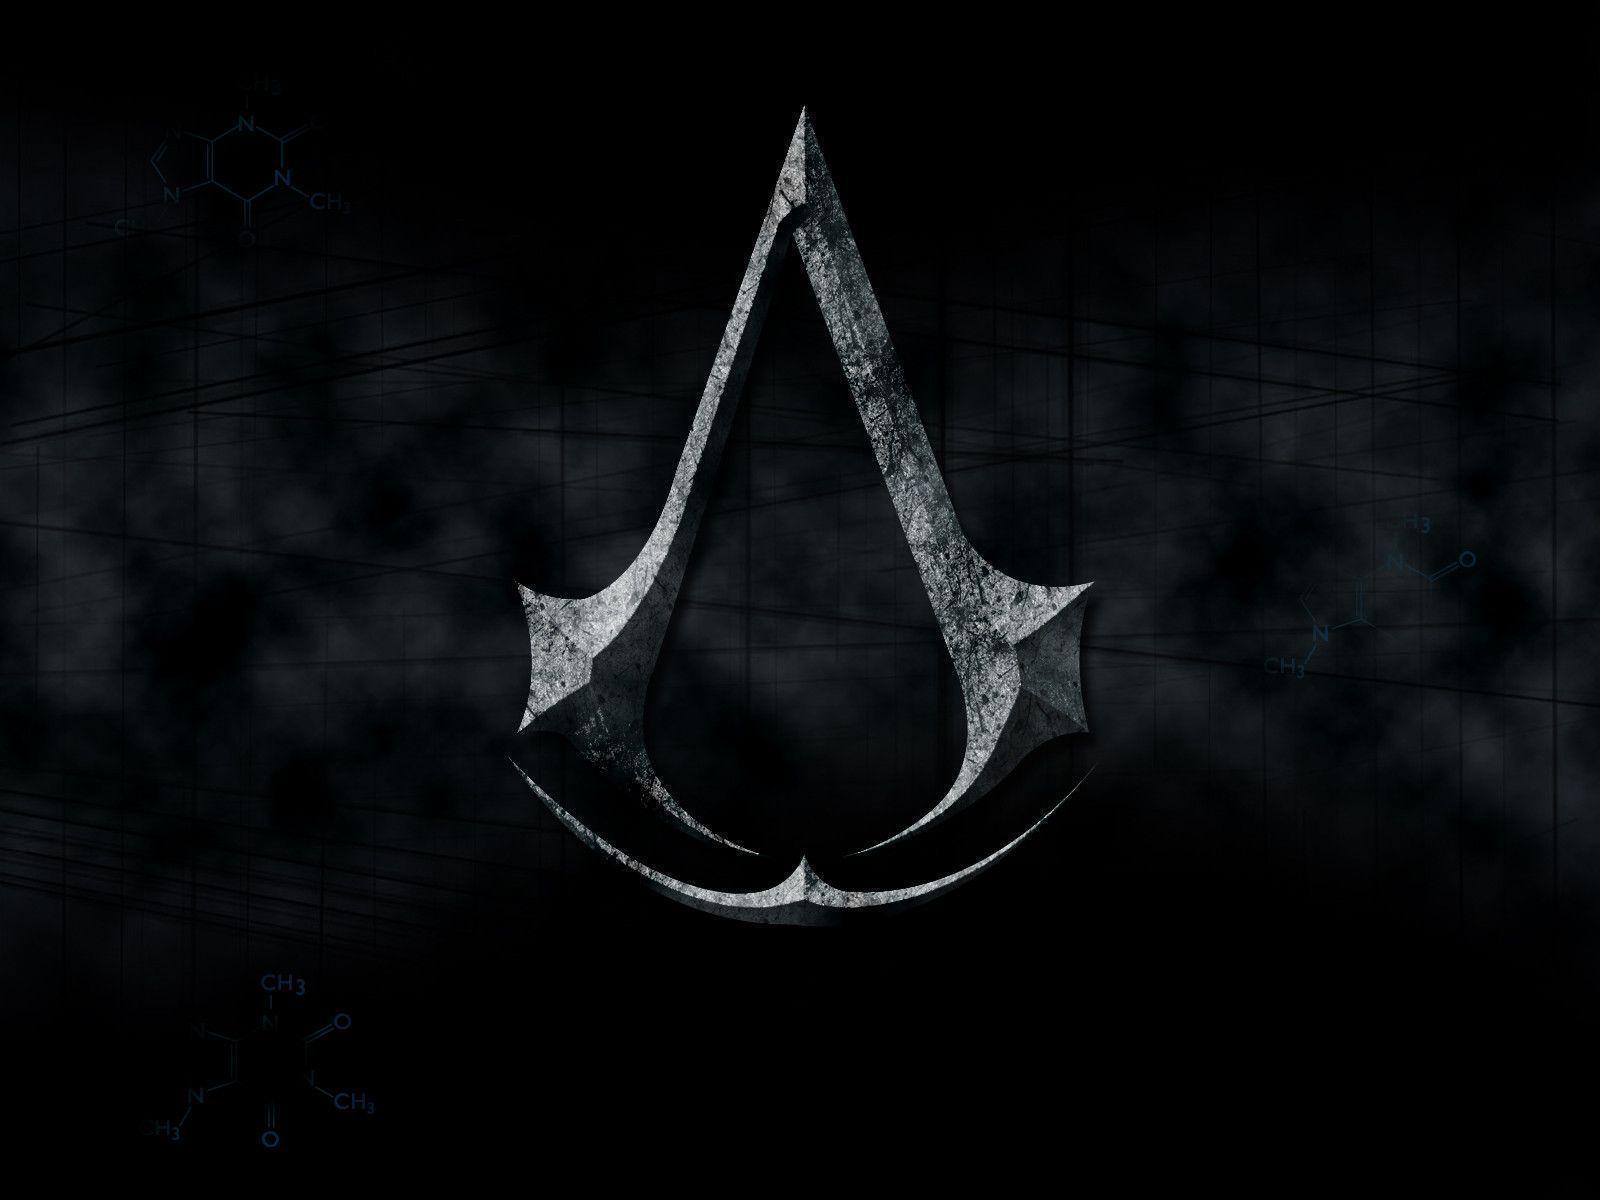 Assassins Creed Symbol Wallpapers 1600x1200